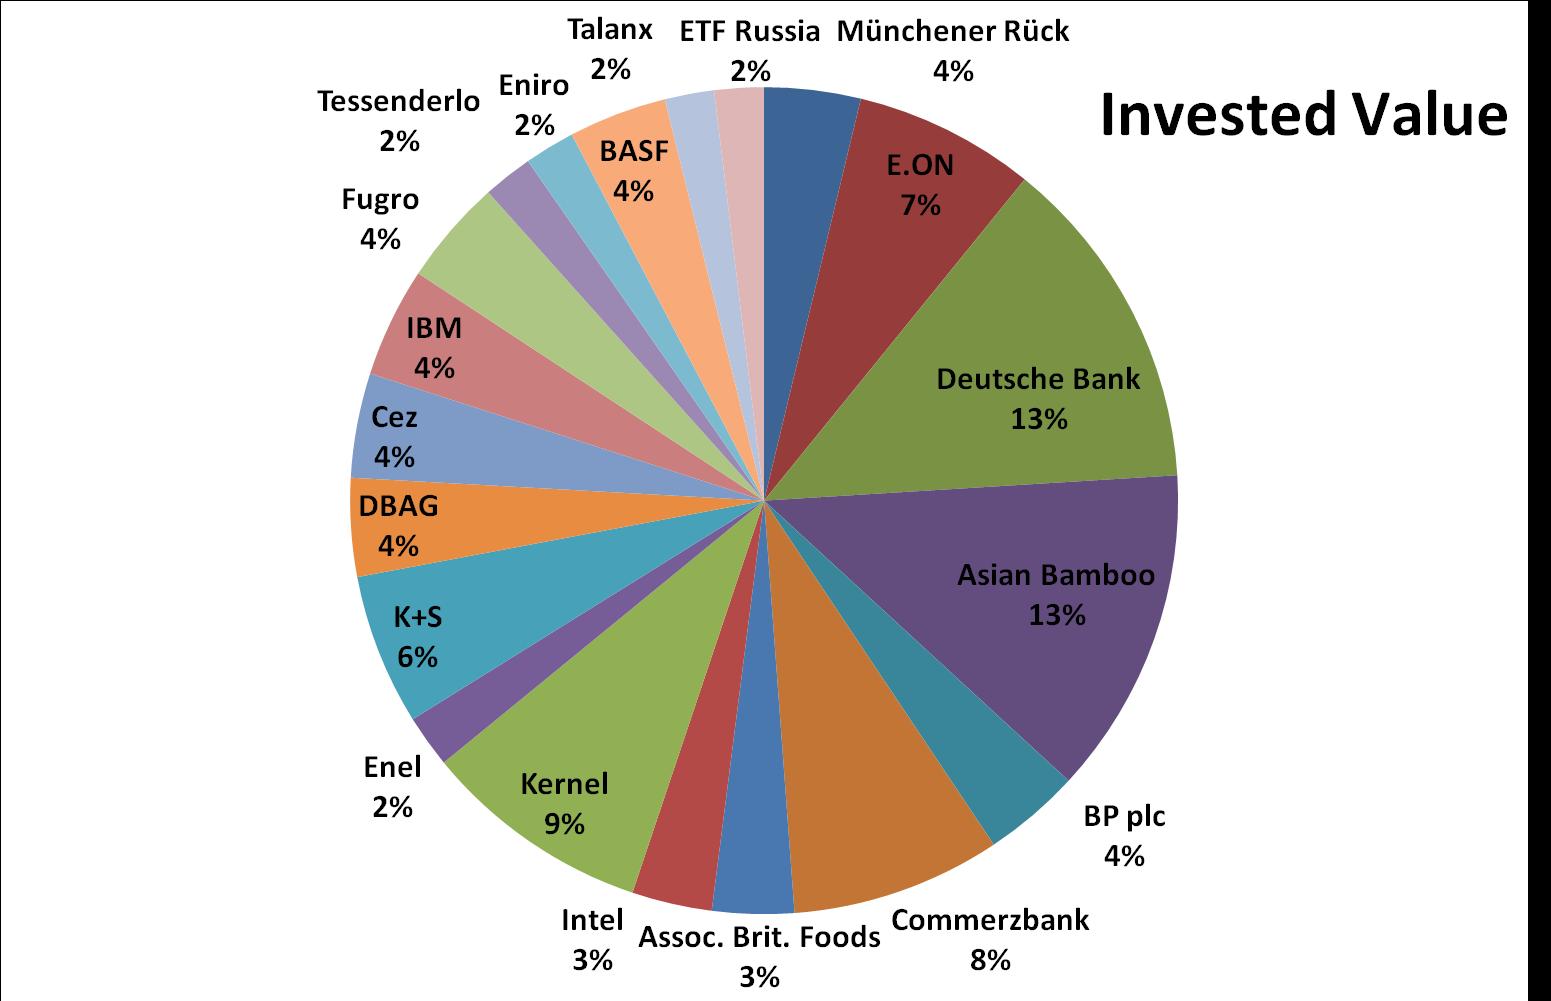 December, 2014, invested value